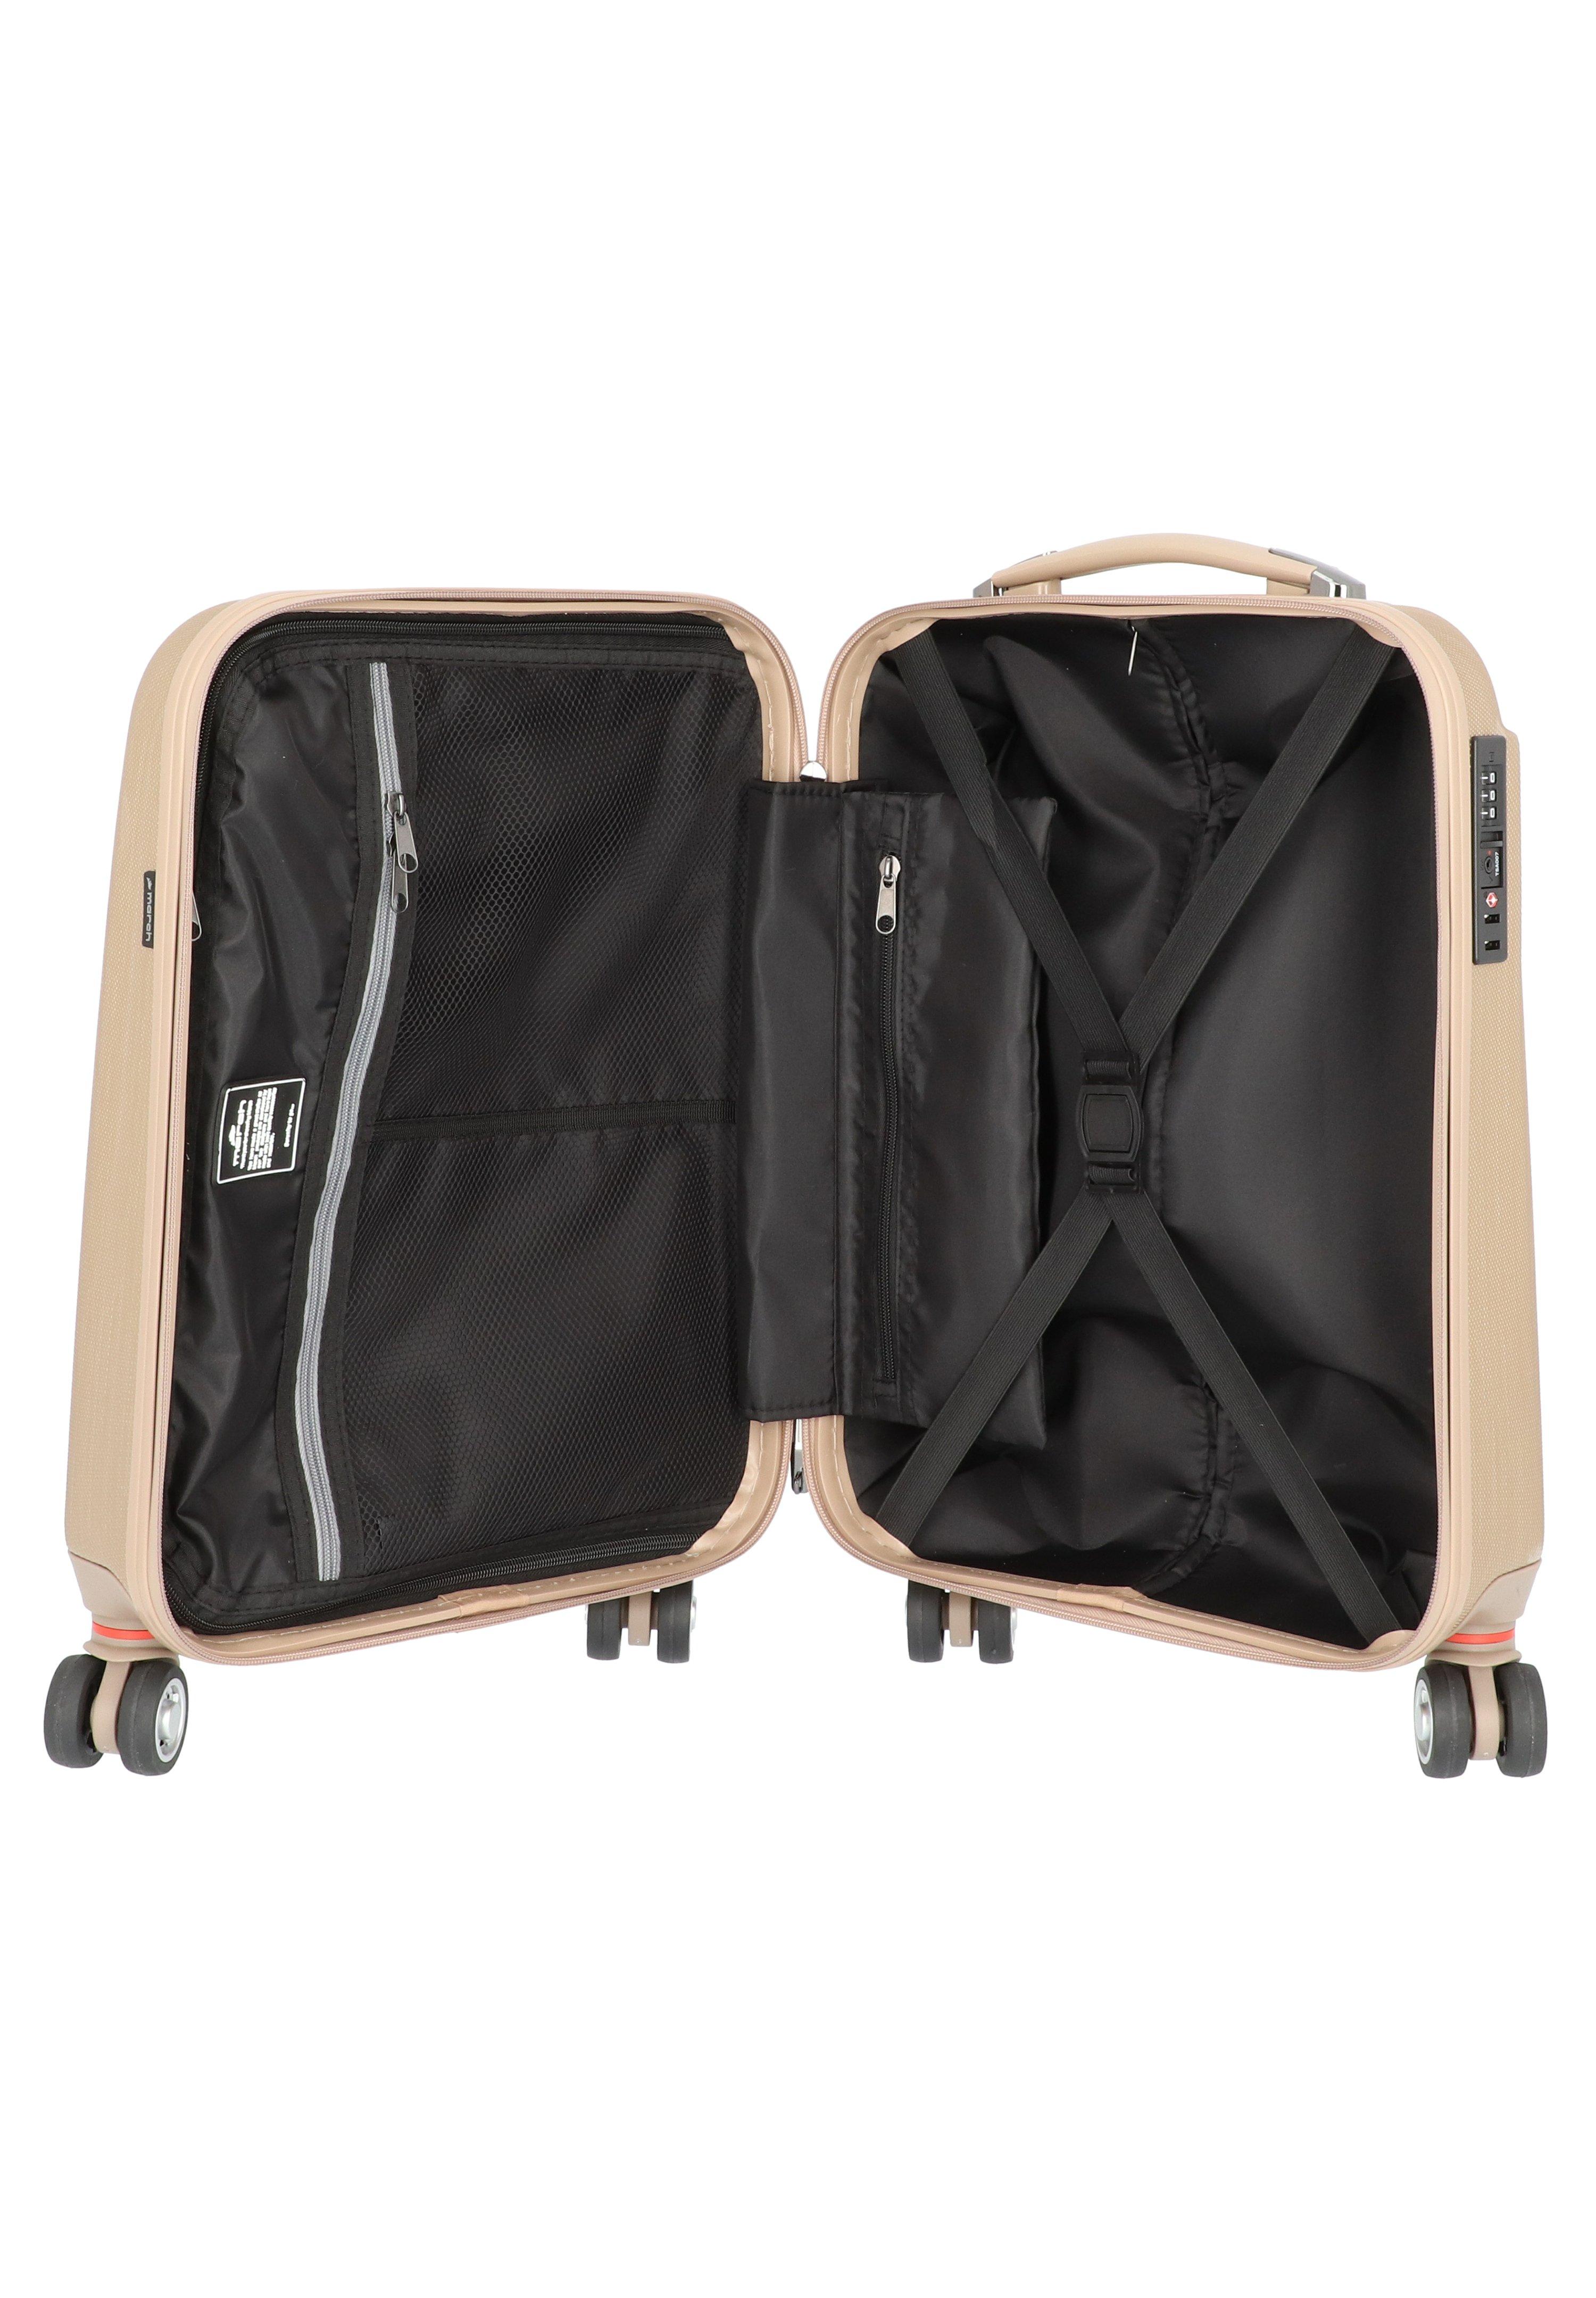 Super Hot Koop Accessoires voor heren IHI564JFOImarch luggage Trolley gold brushed L0t3JO5